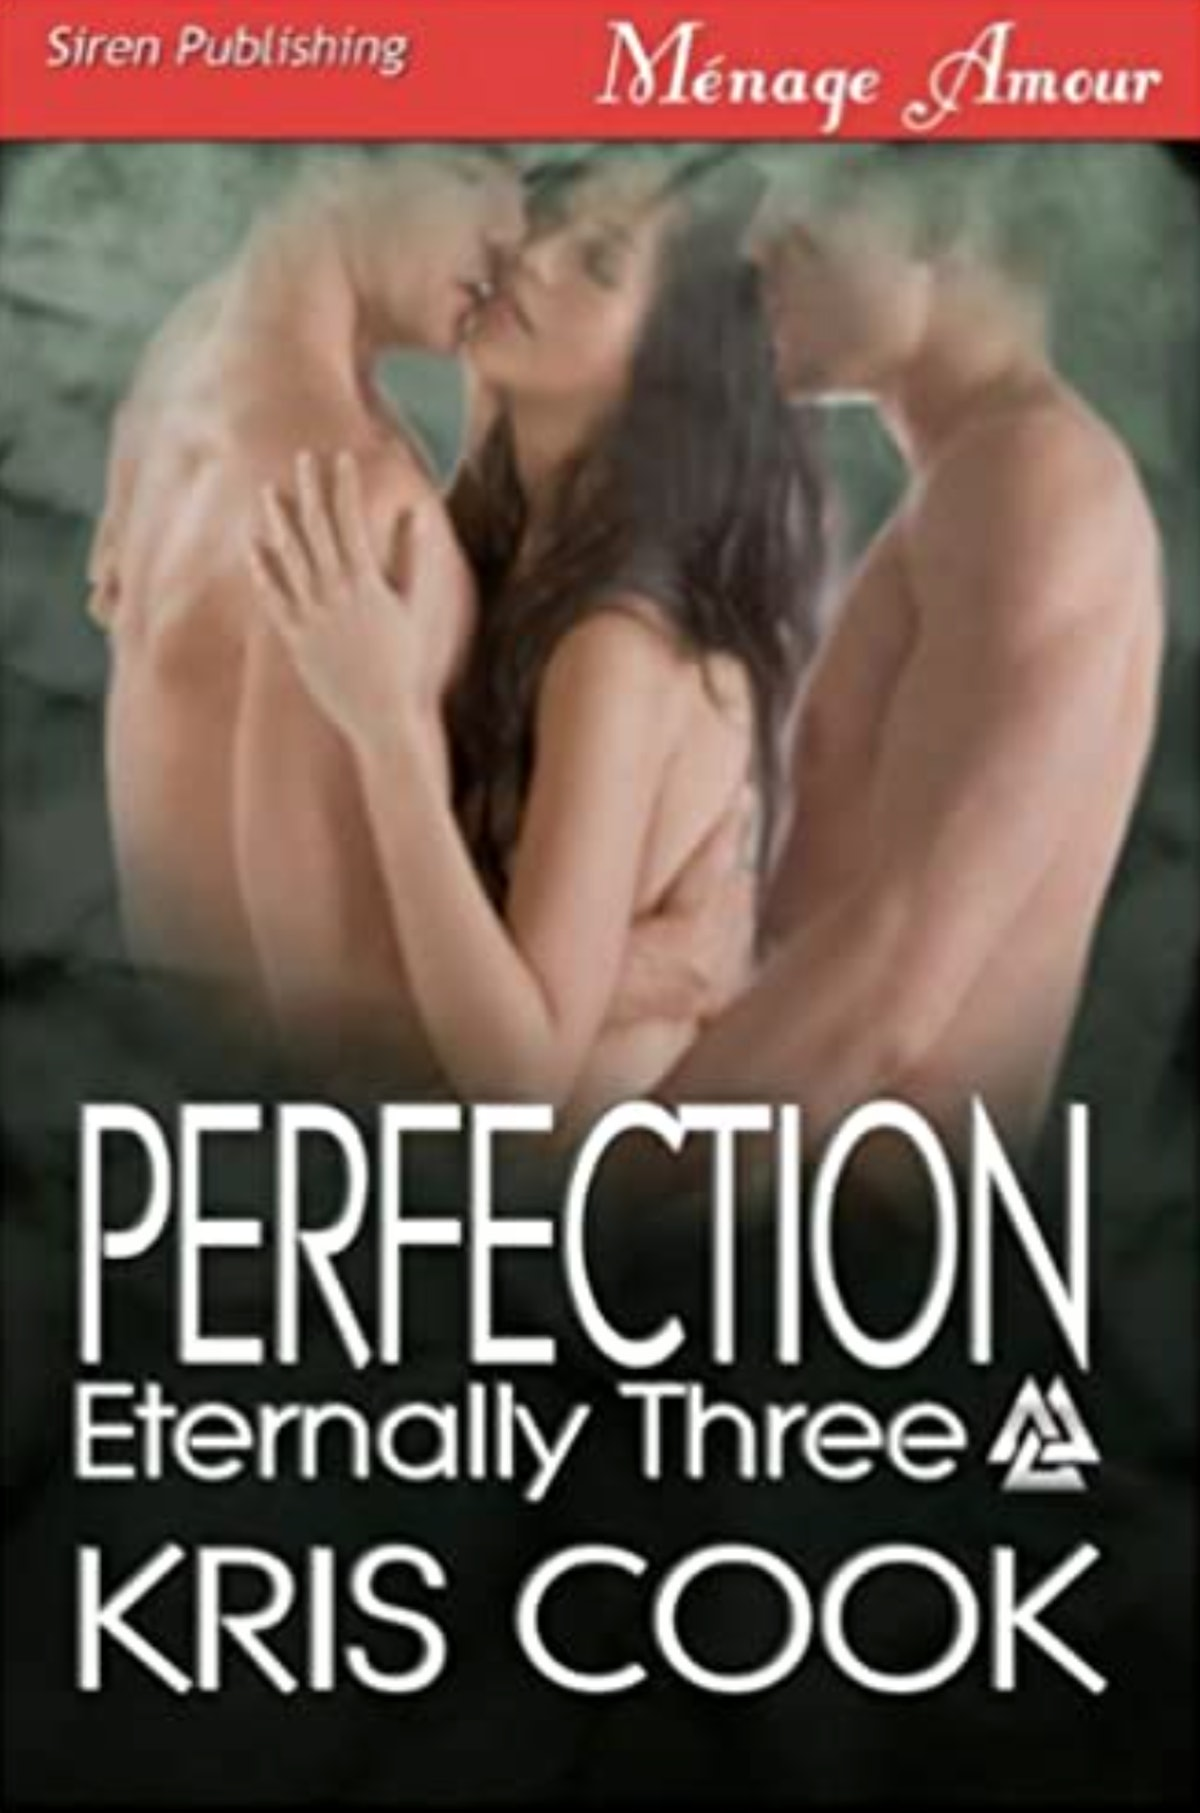 Eternally Three